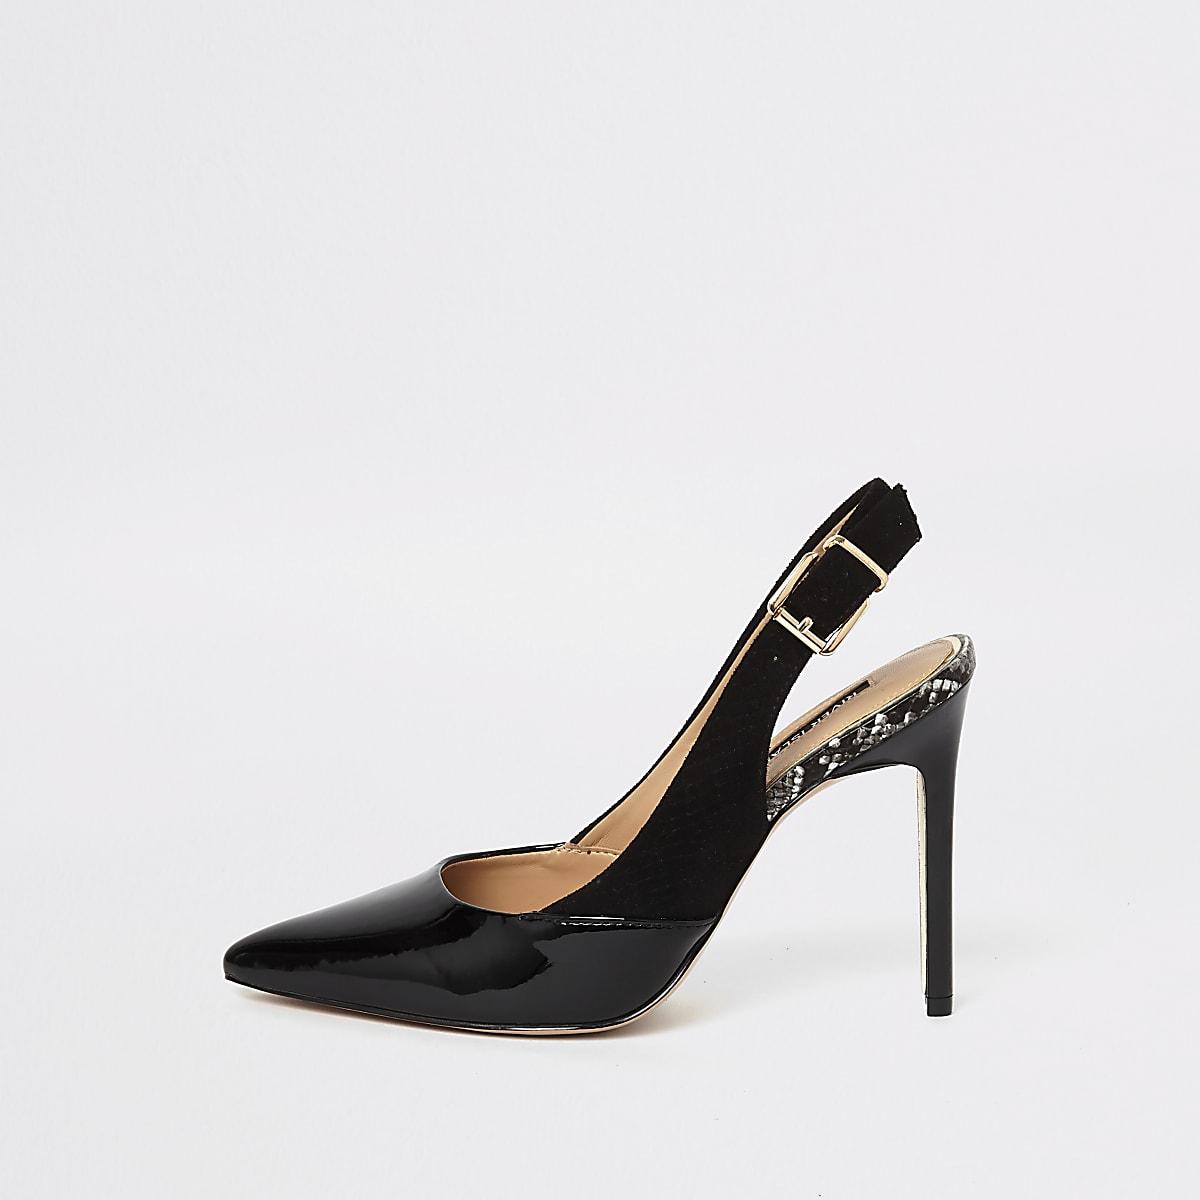 Black pointed toe slingback pumps